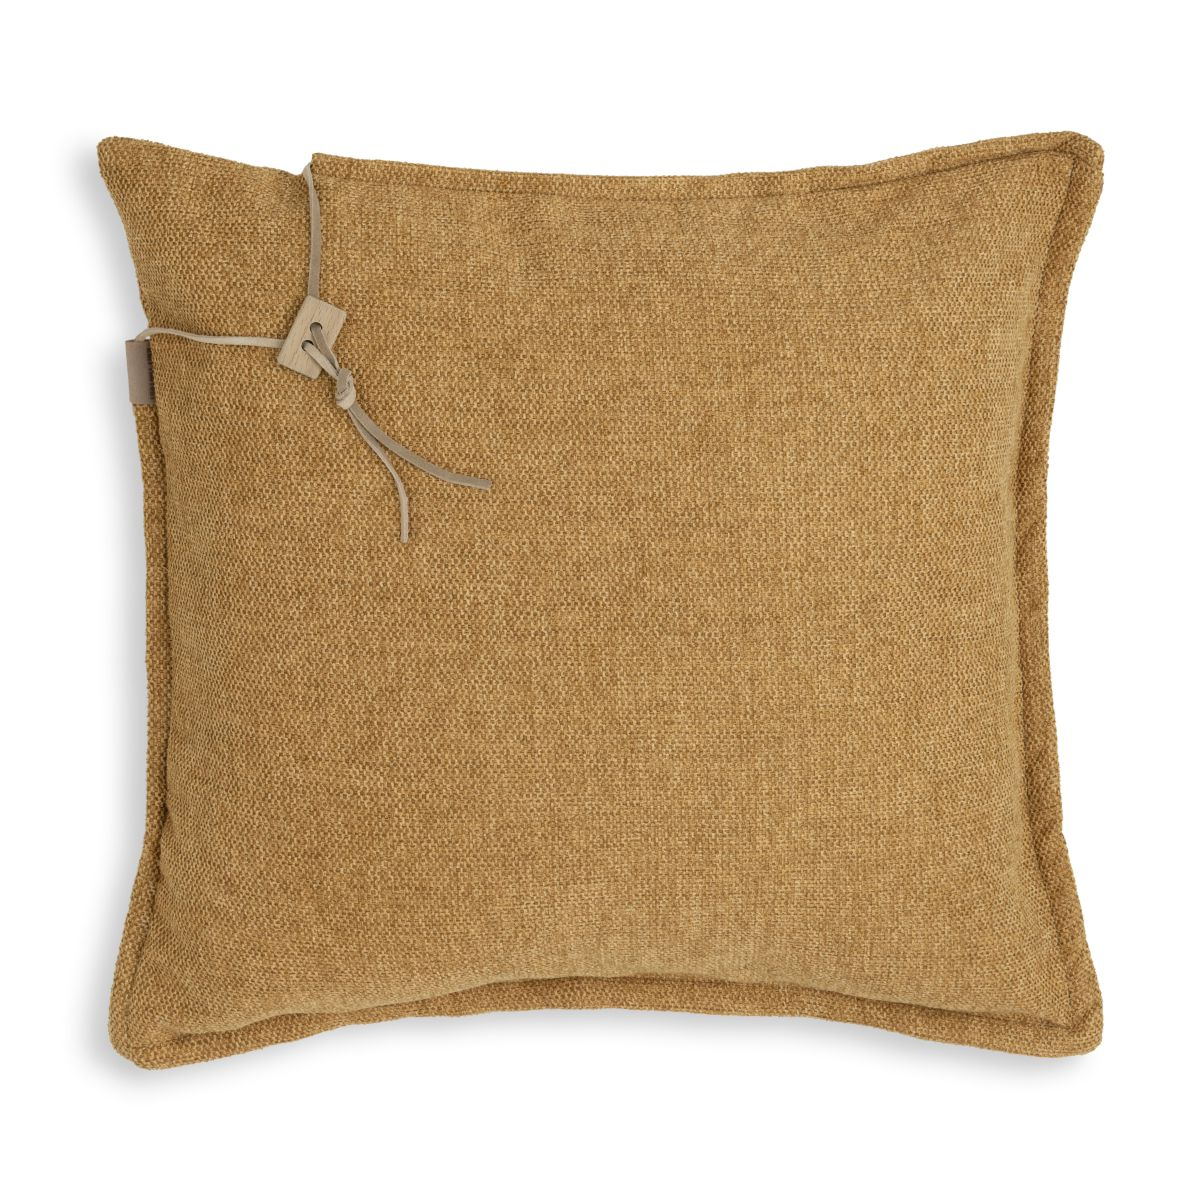 knit factory kf153012017 imre kussen oker 50x50 1